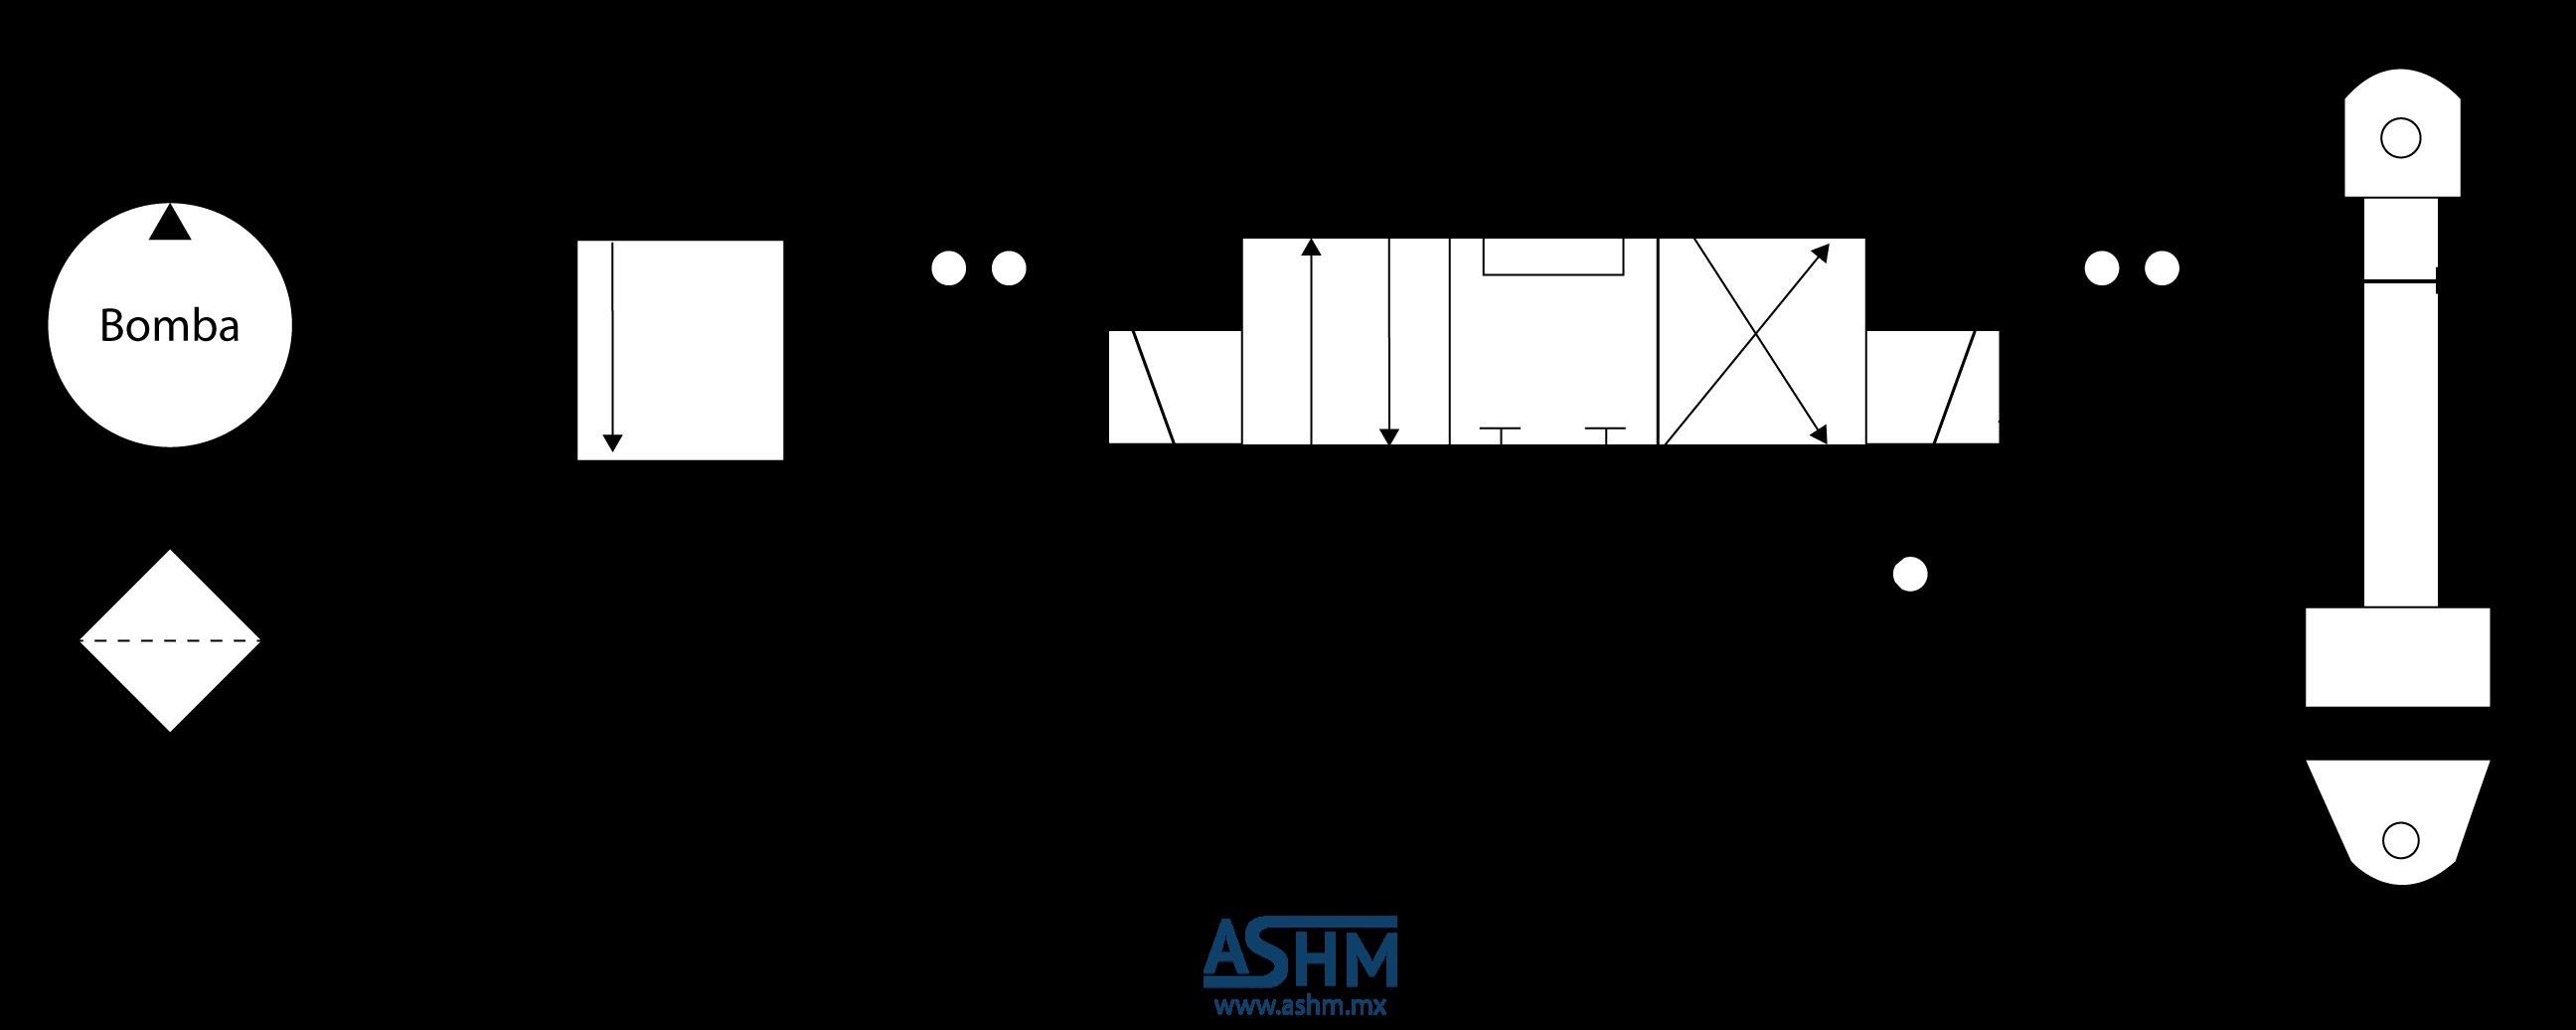 Circuito Hidraulico Basico : Diagrama sistema hidraulico basico hidráulico